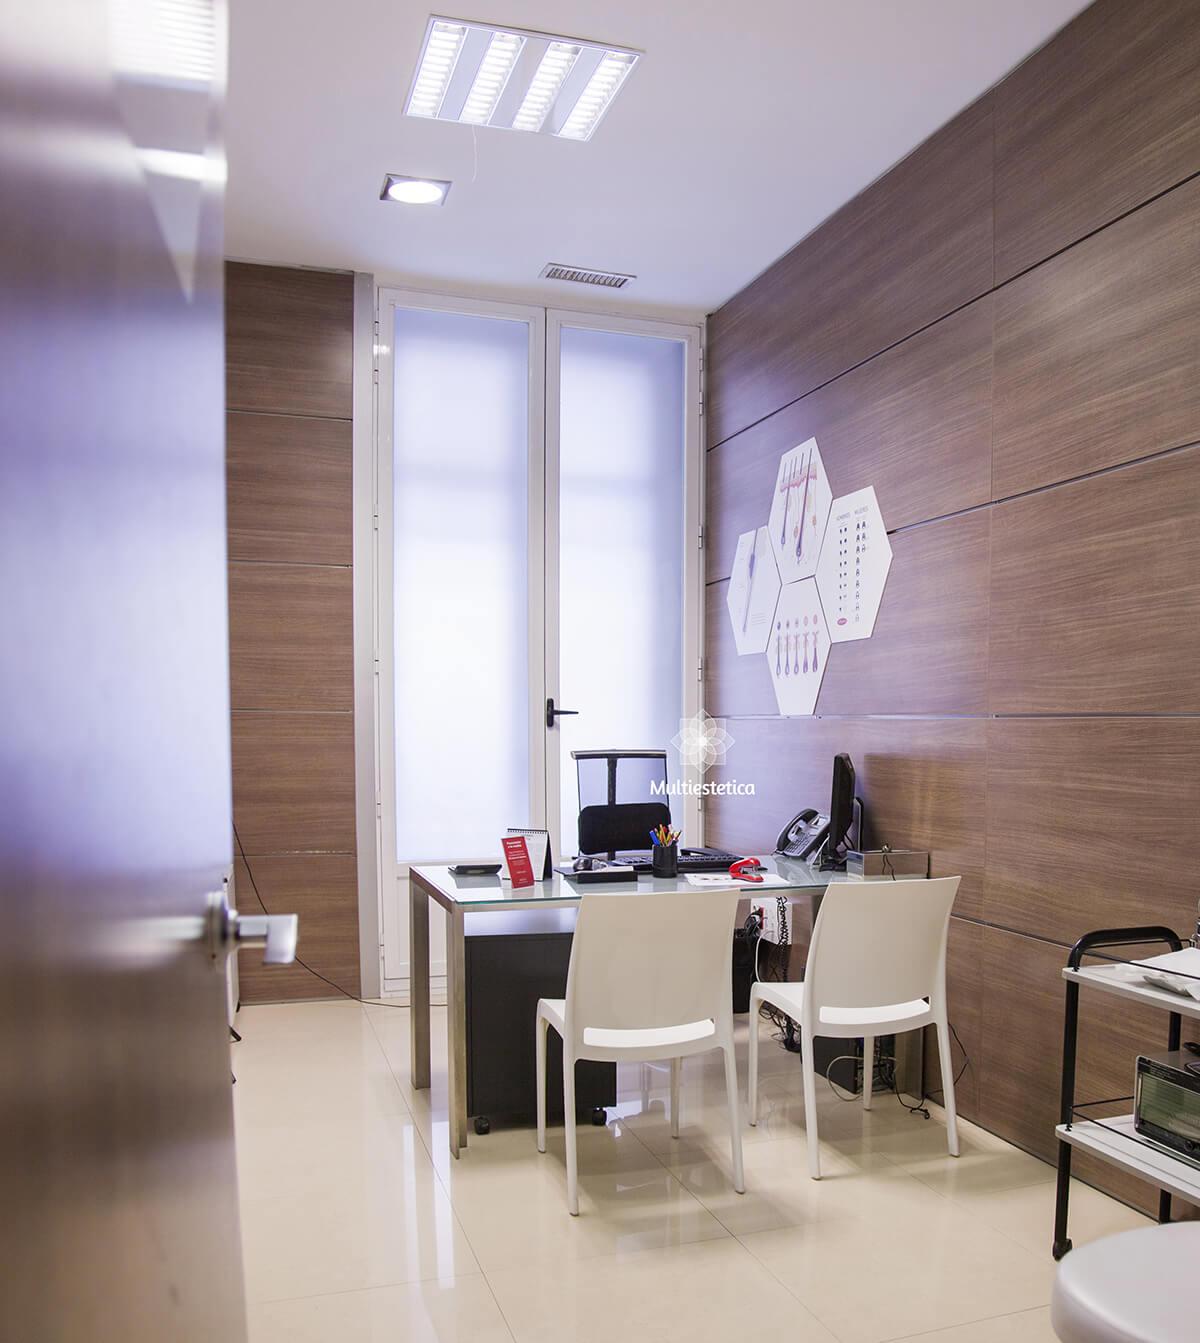 Centro Svenson Despacho Madrid Velazquez